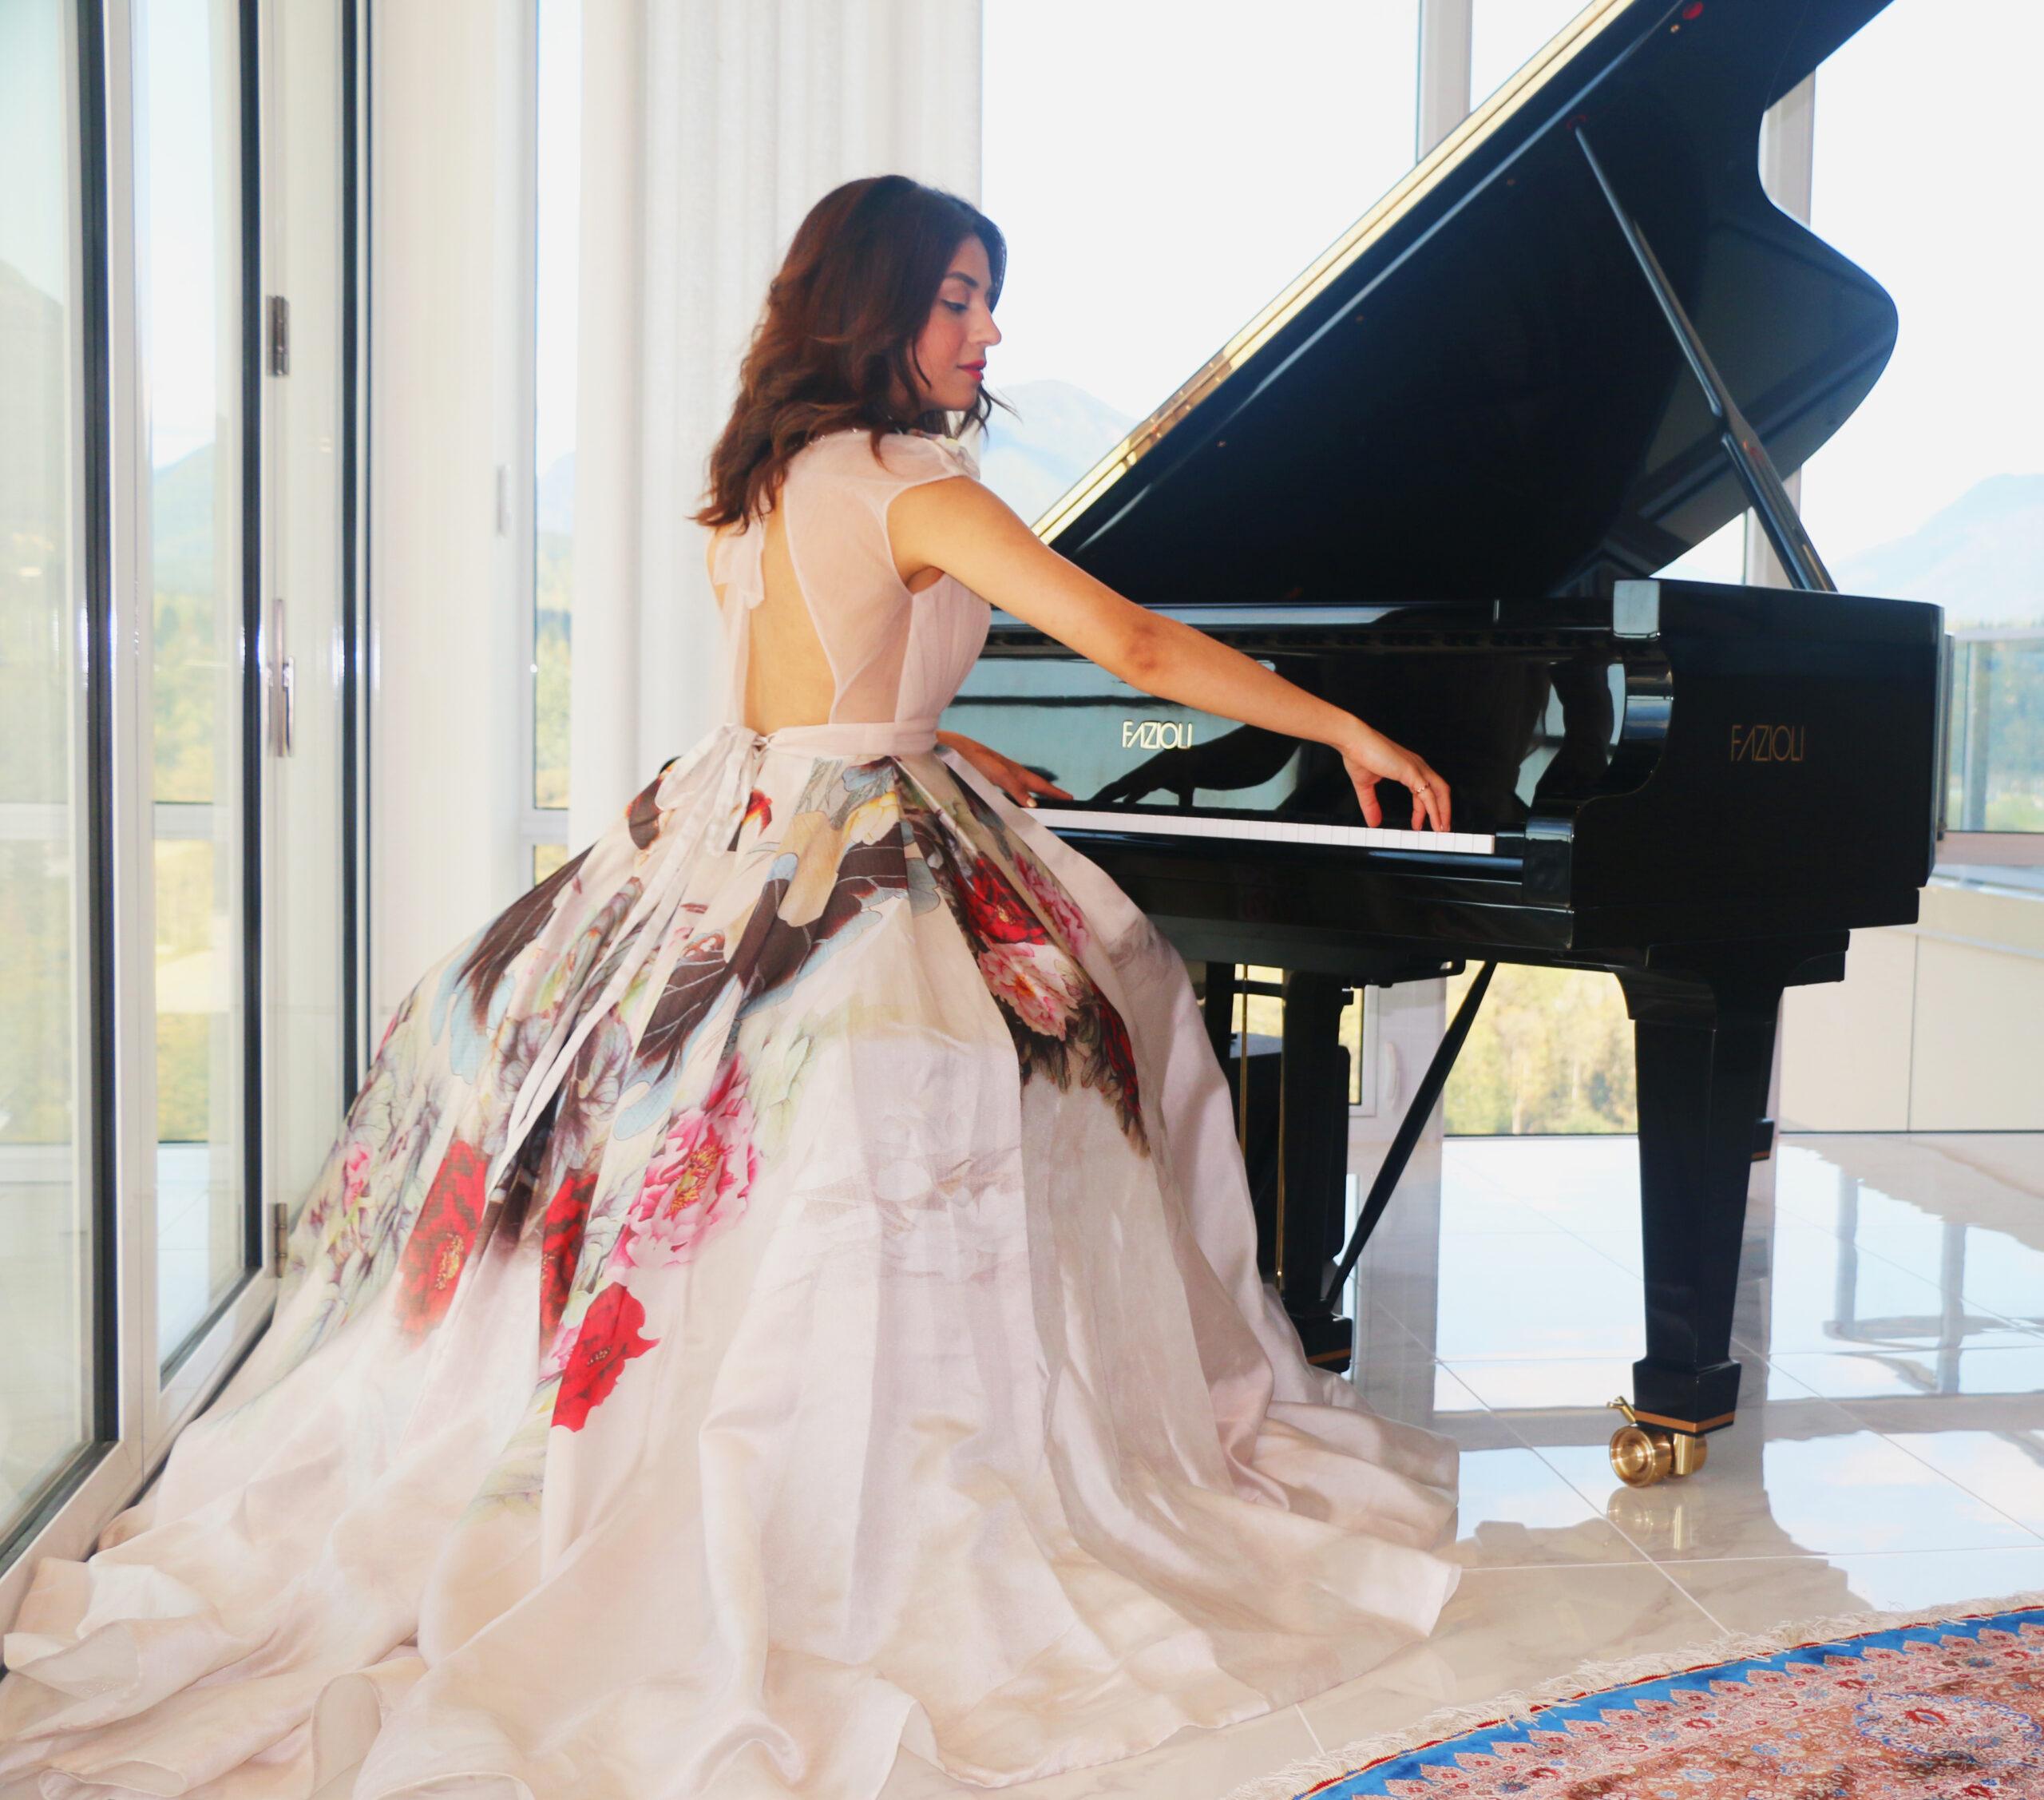 sanaz sotoudeh, pianist, dubai, helen siwak, mona rose butler, fazioli, vancouver, vancity, bc, yvr, ecoluxluv, folioyvr